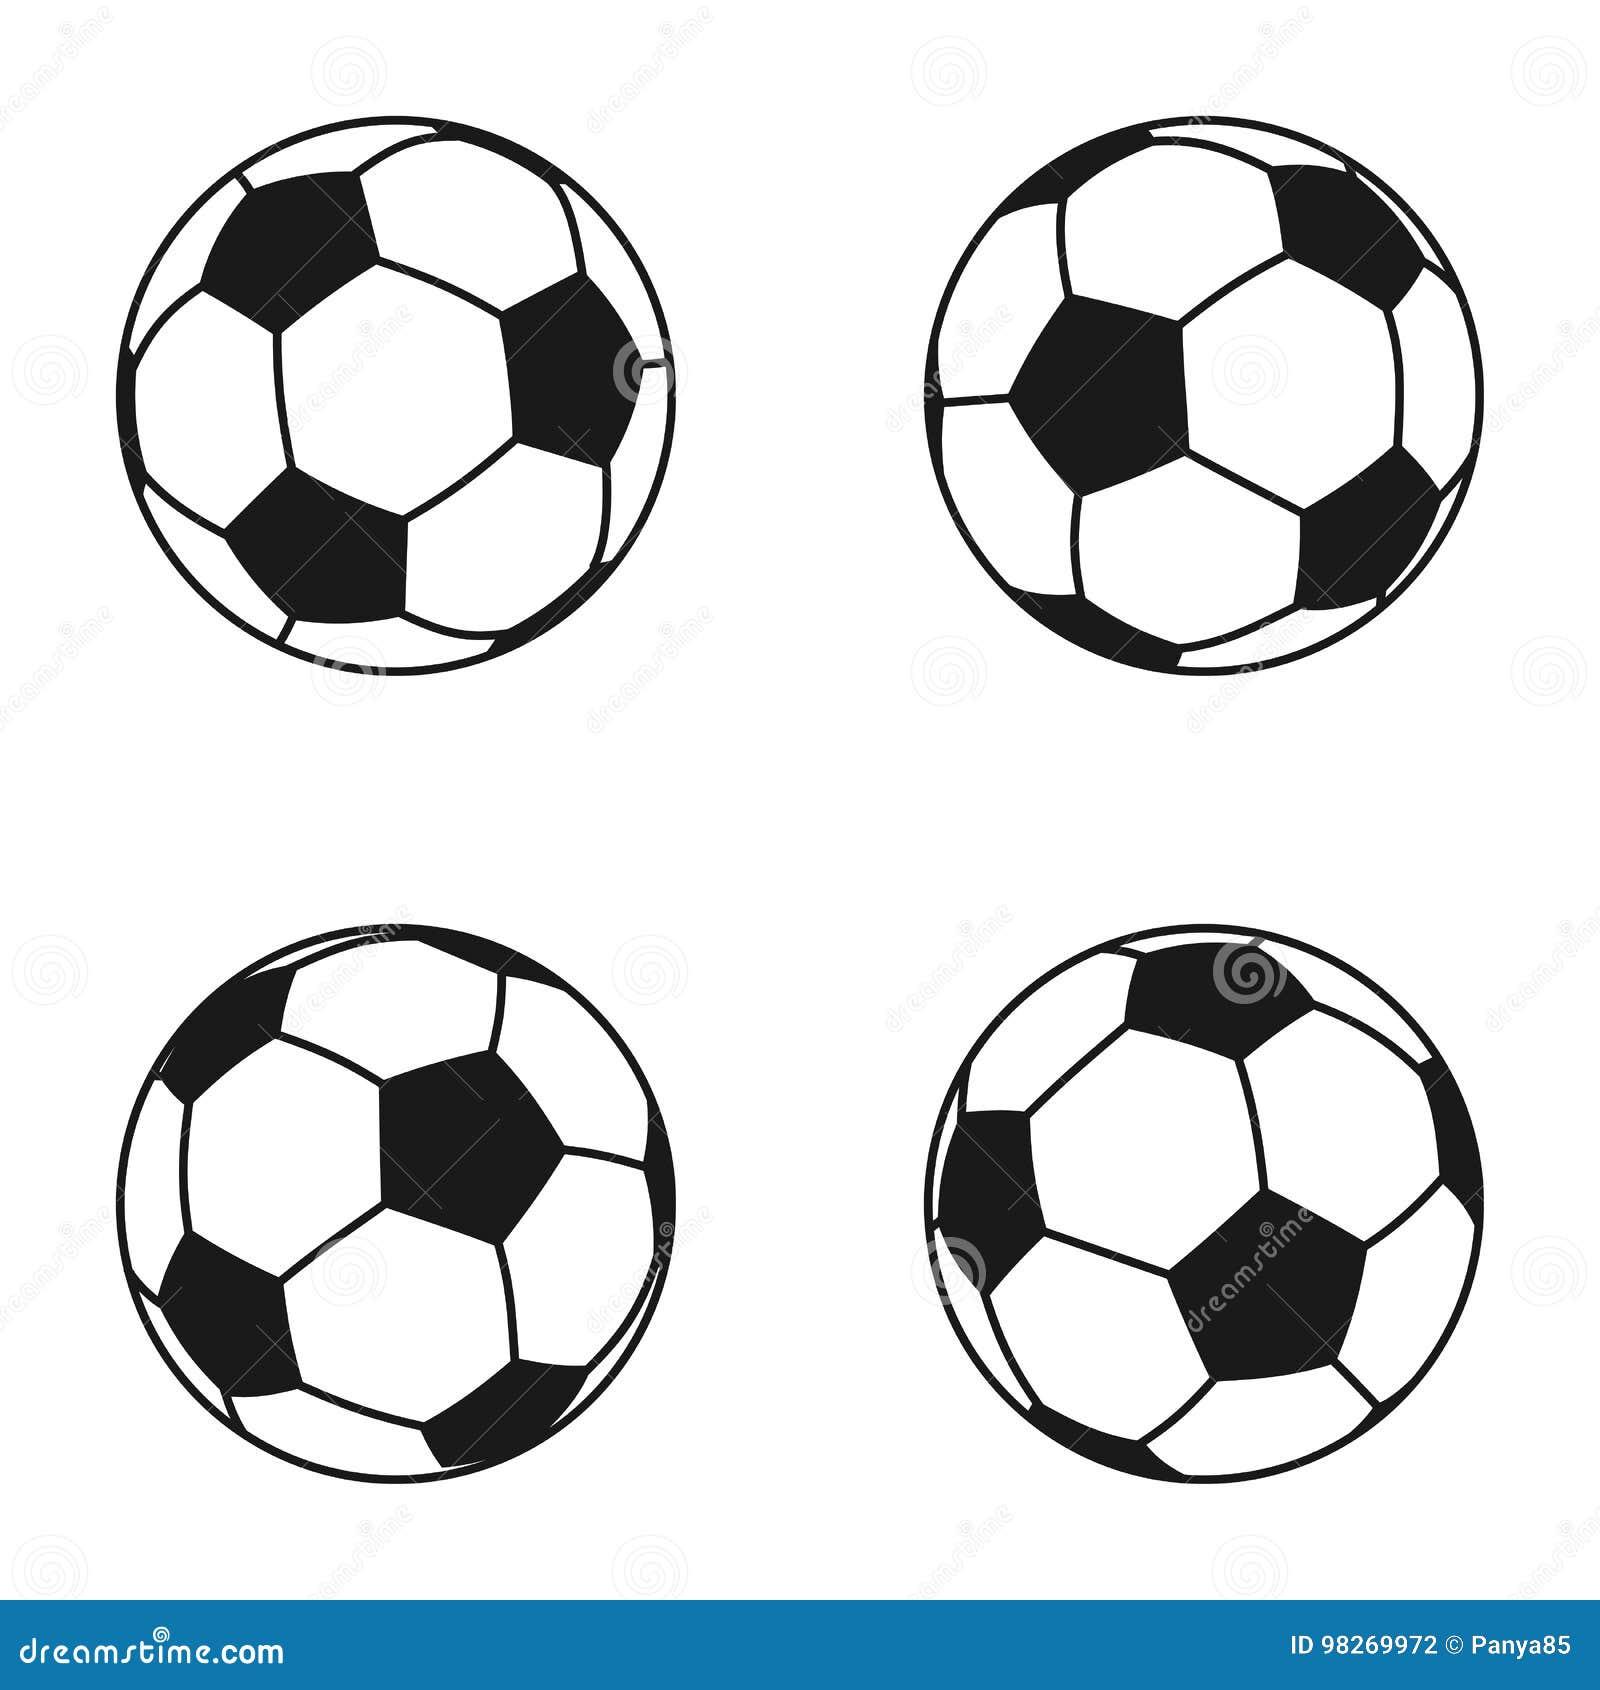 Ikonensatz Des Balls Fur Europaischen Fussball Fussballsymbol